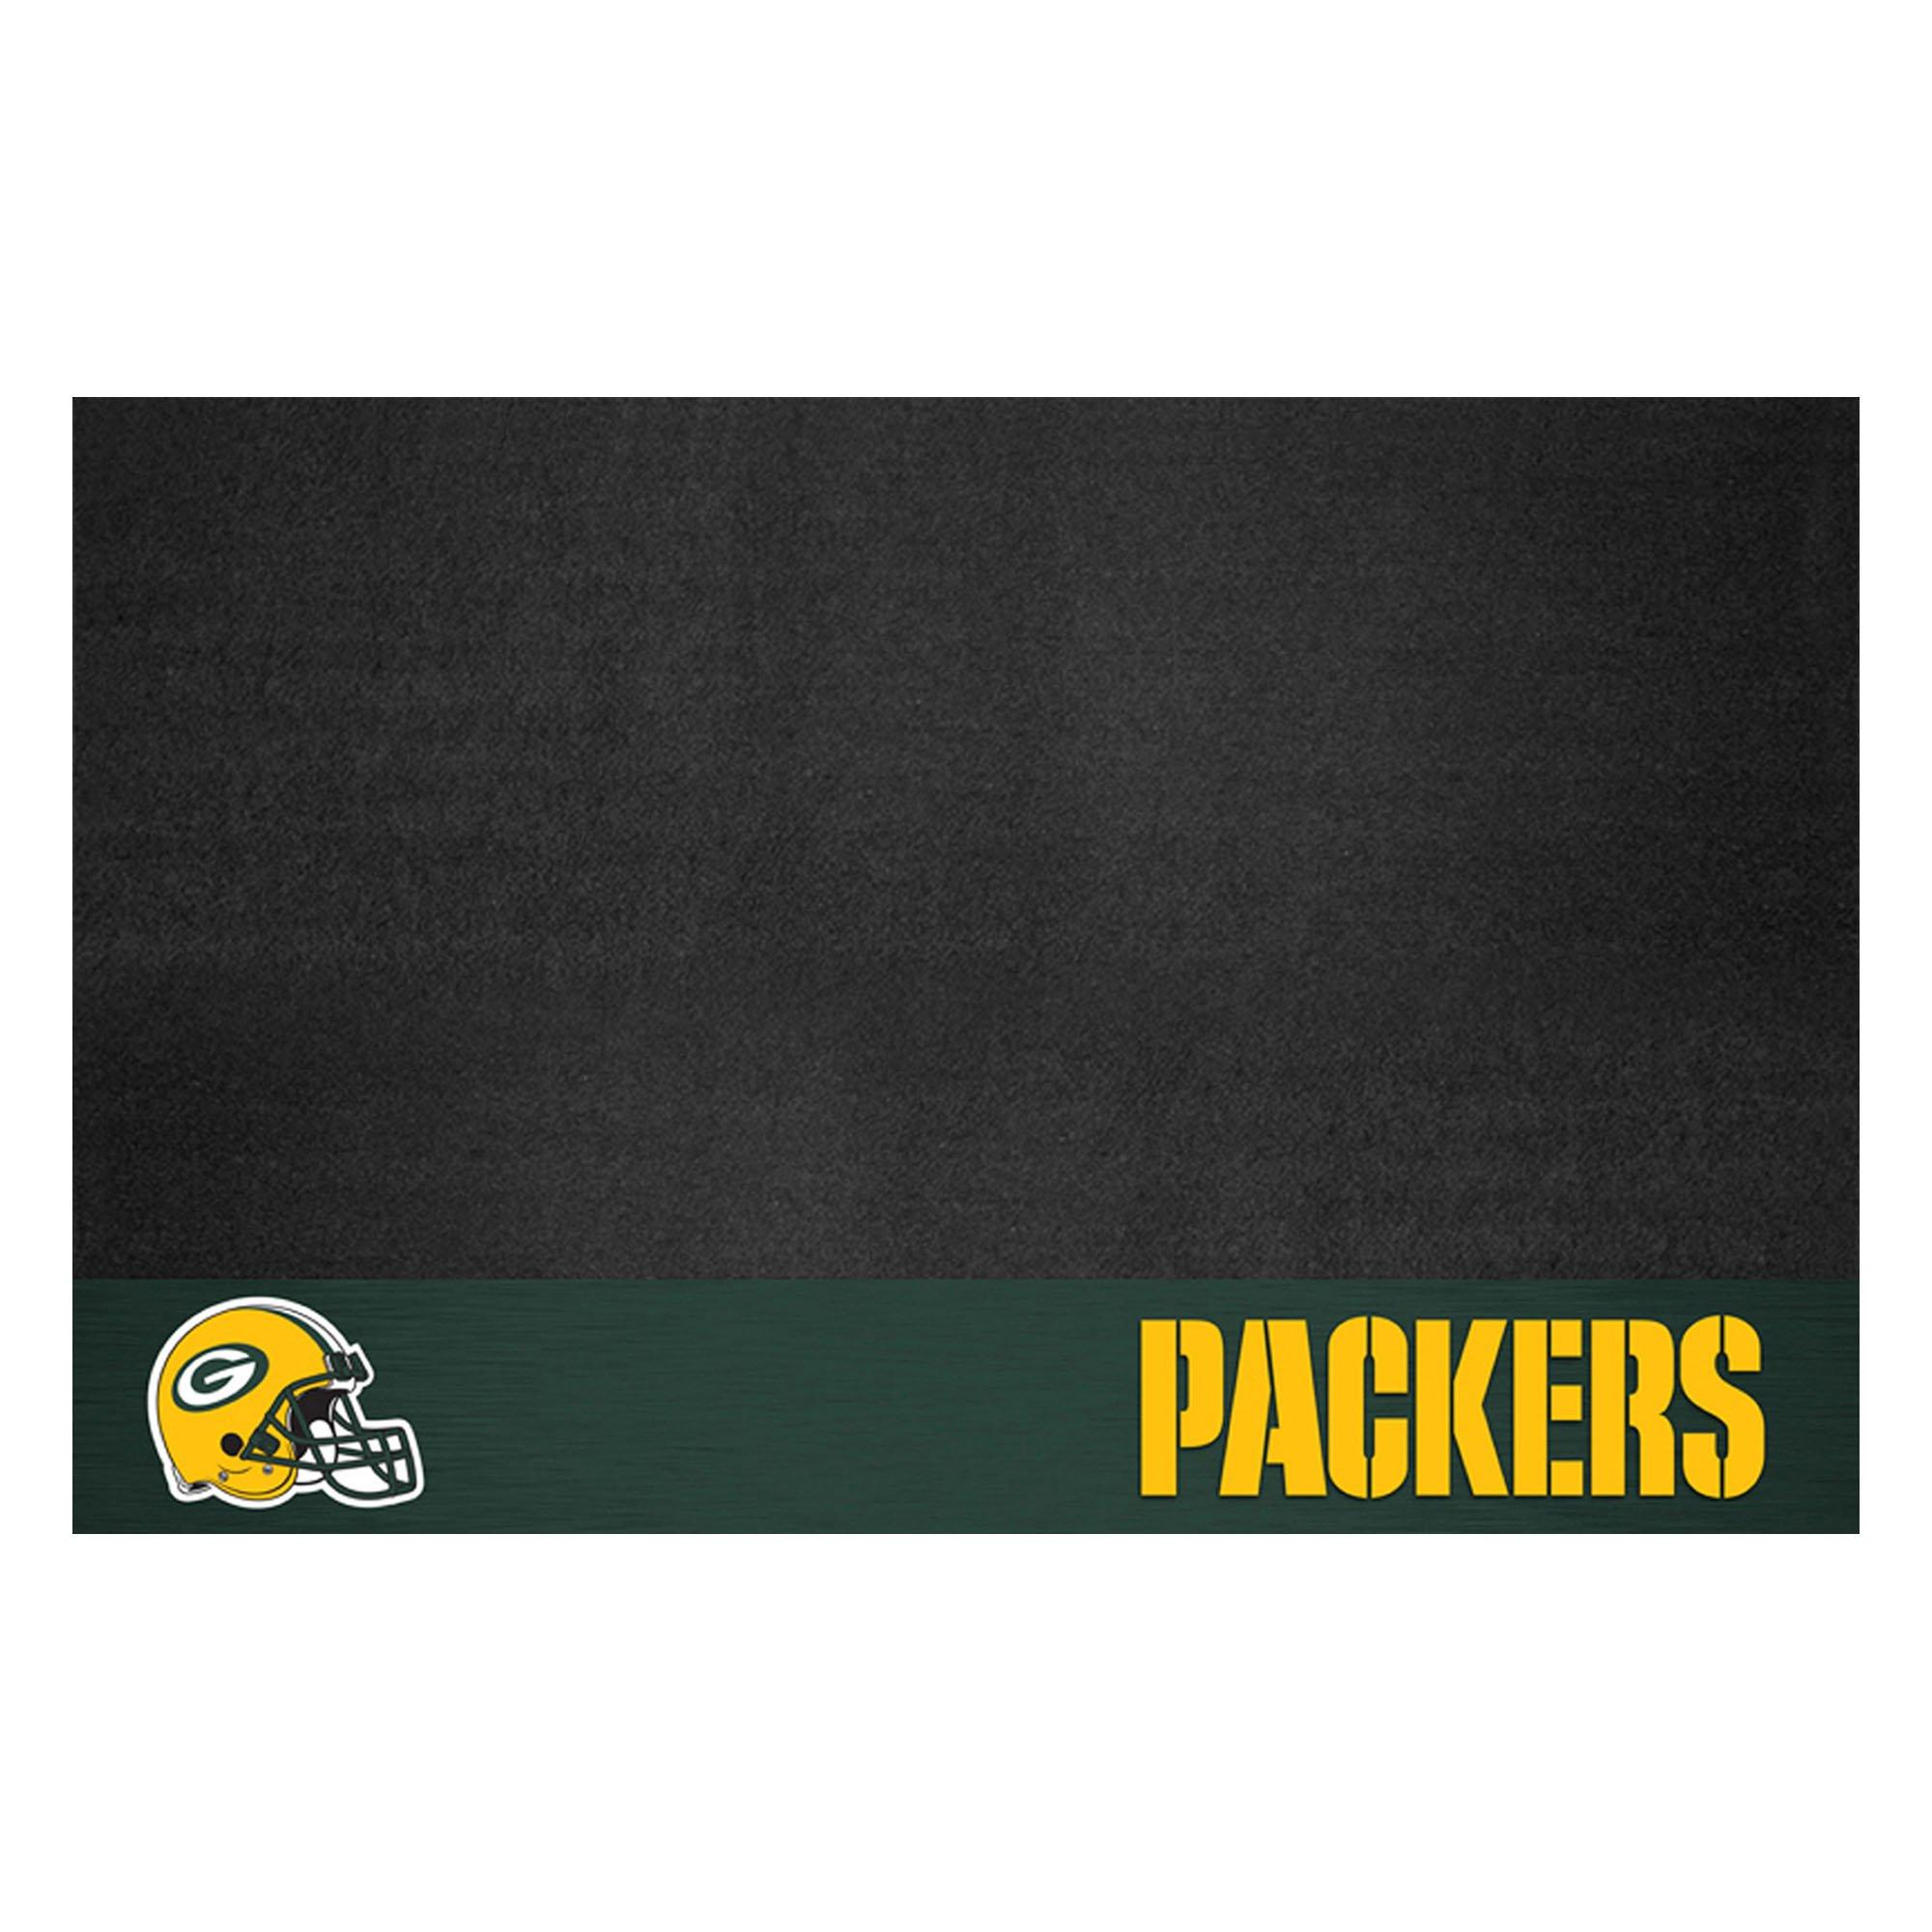 FANMATS NFL Green Bay Packers Vinyl Grill Mat by FANMATS